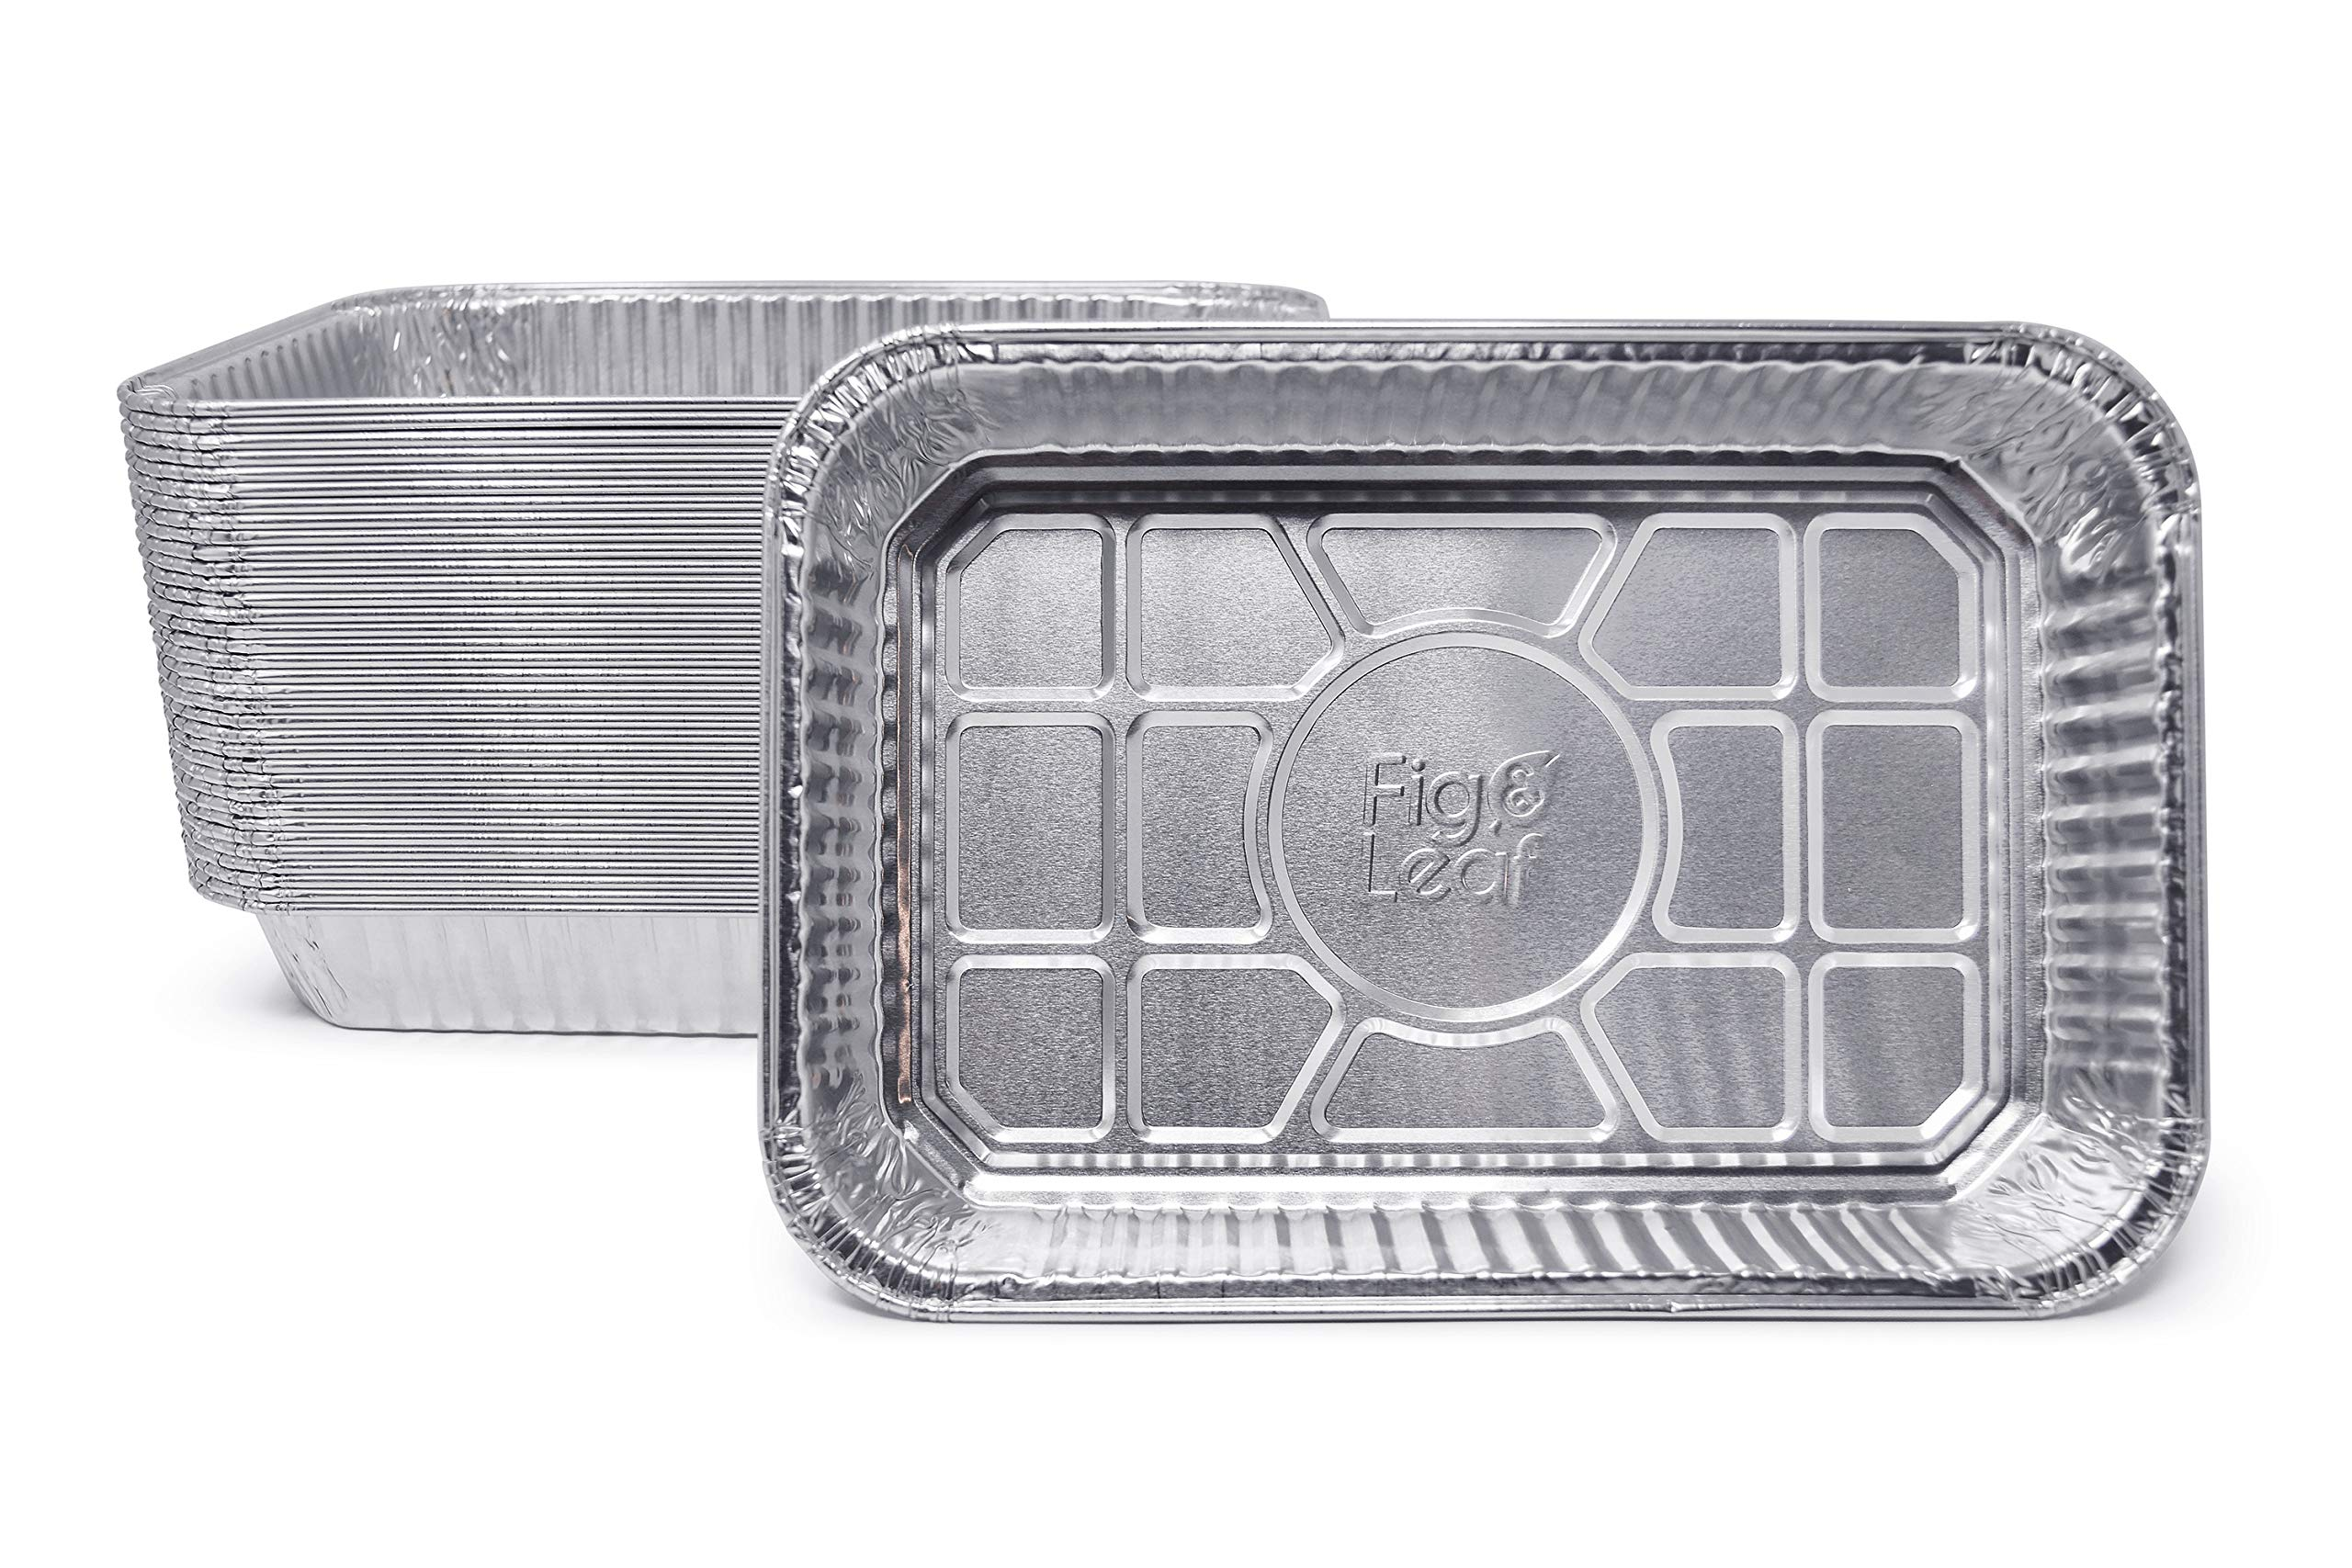 Fig & Leaf (35 Pack) Weber Grills Compatible 6415 Drip Pans l Size 7.5'' x 5'' x 1.7'' l Aluminum Foil l 32 Gauge l Fit for Weber Q Grills, Spirit Gas Grills, Genesis and Genesis II LX 200 300 Series by Fig & Leaf